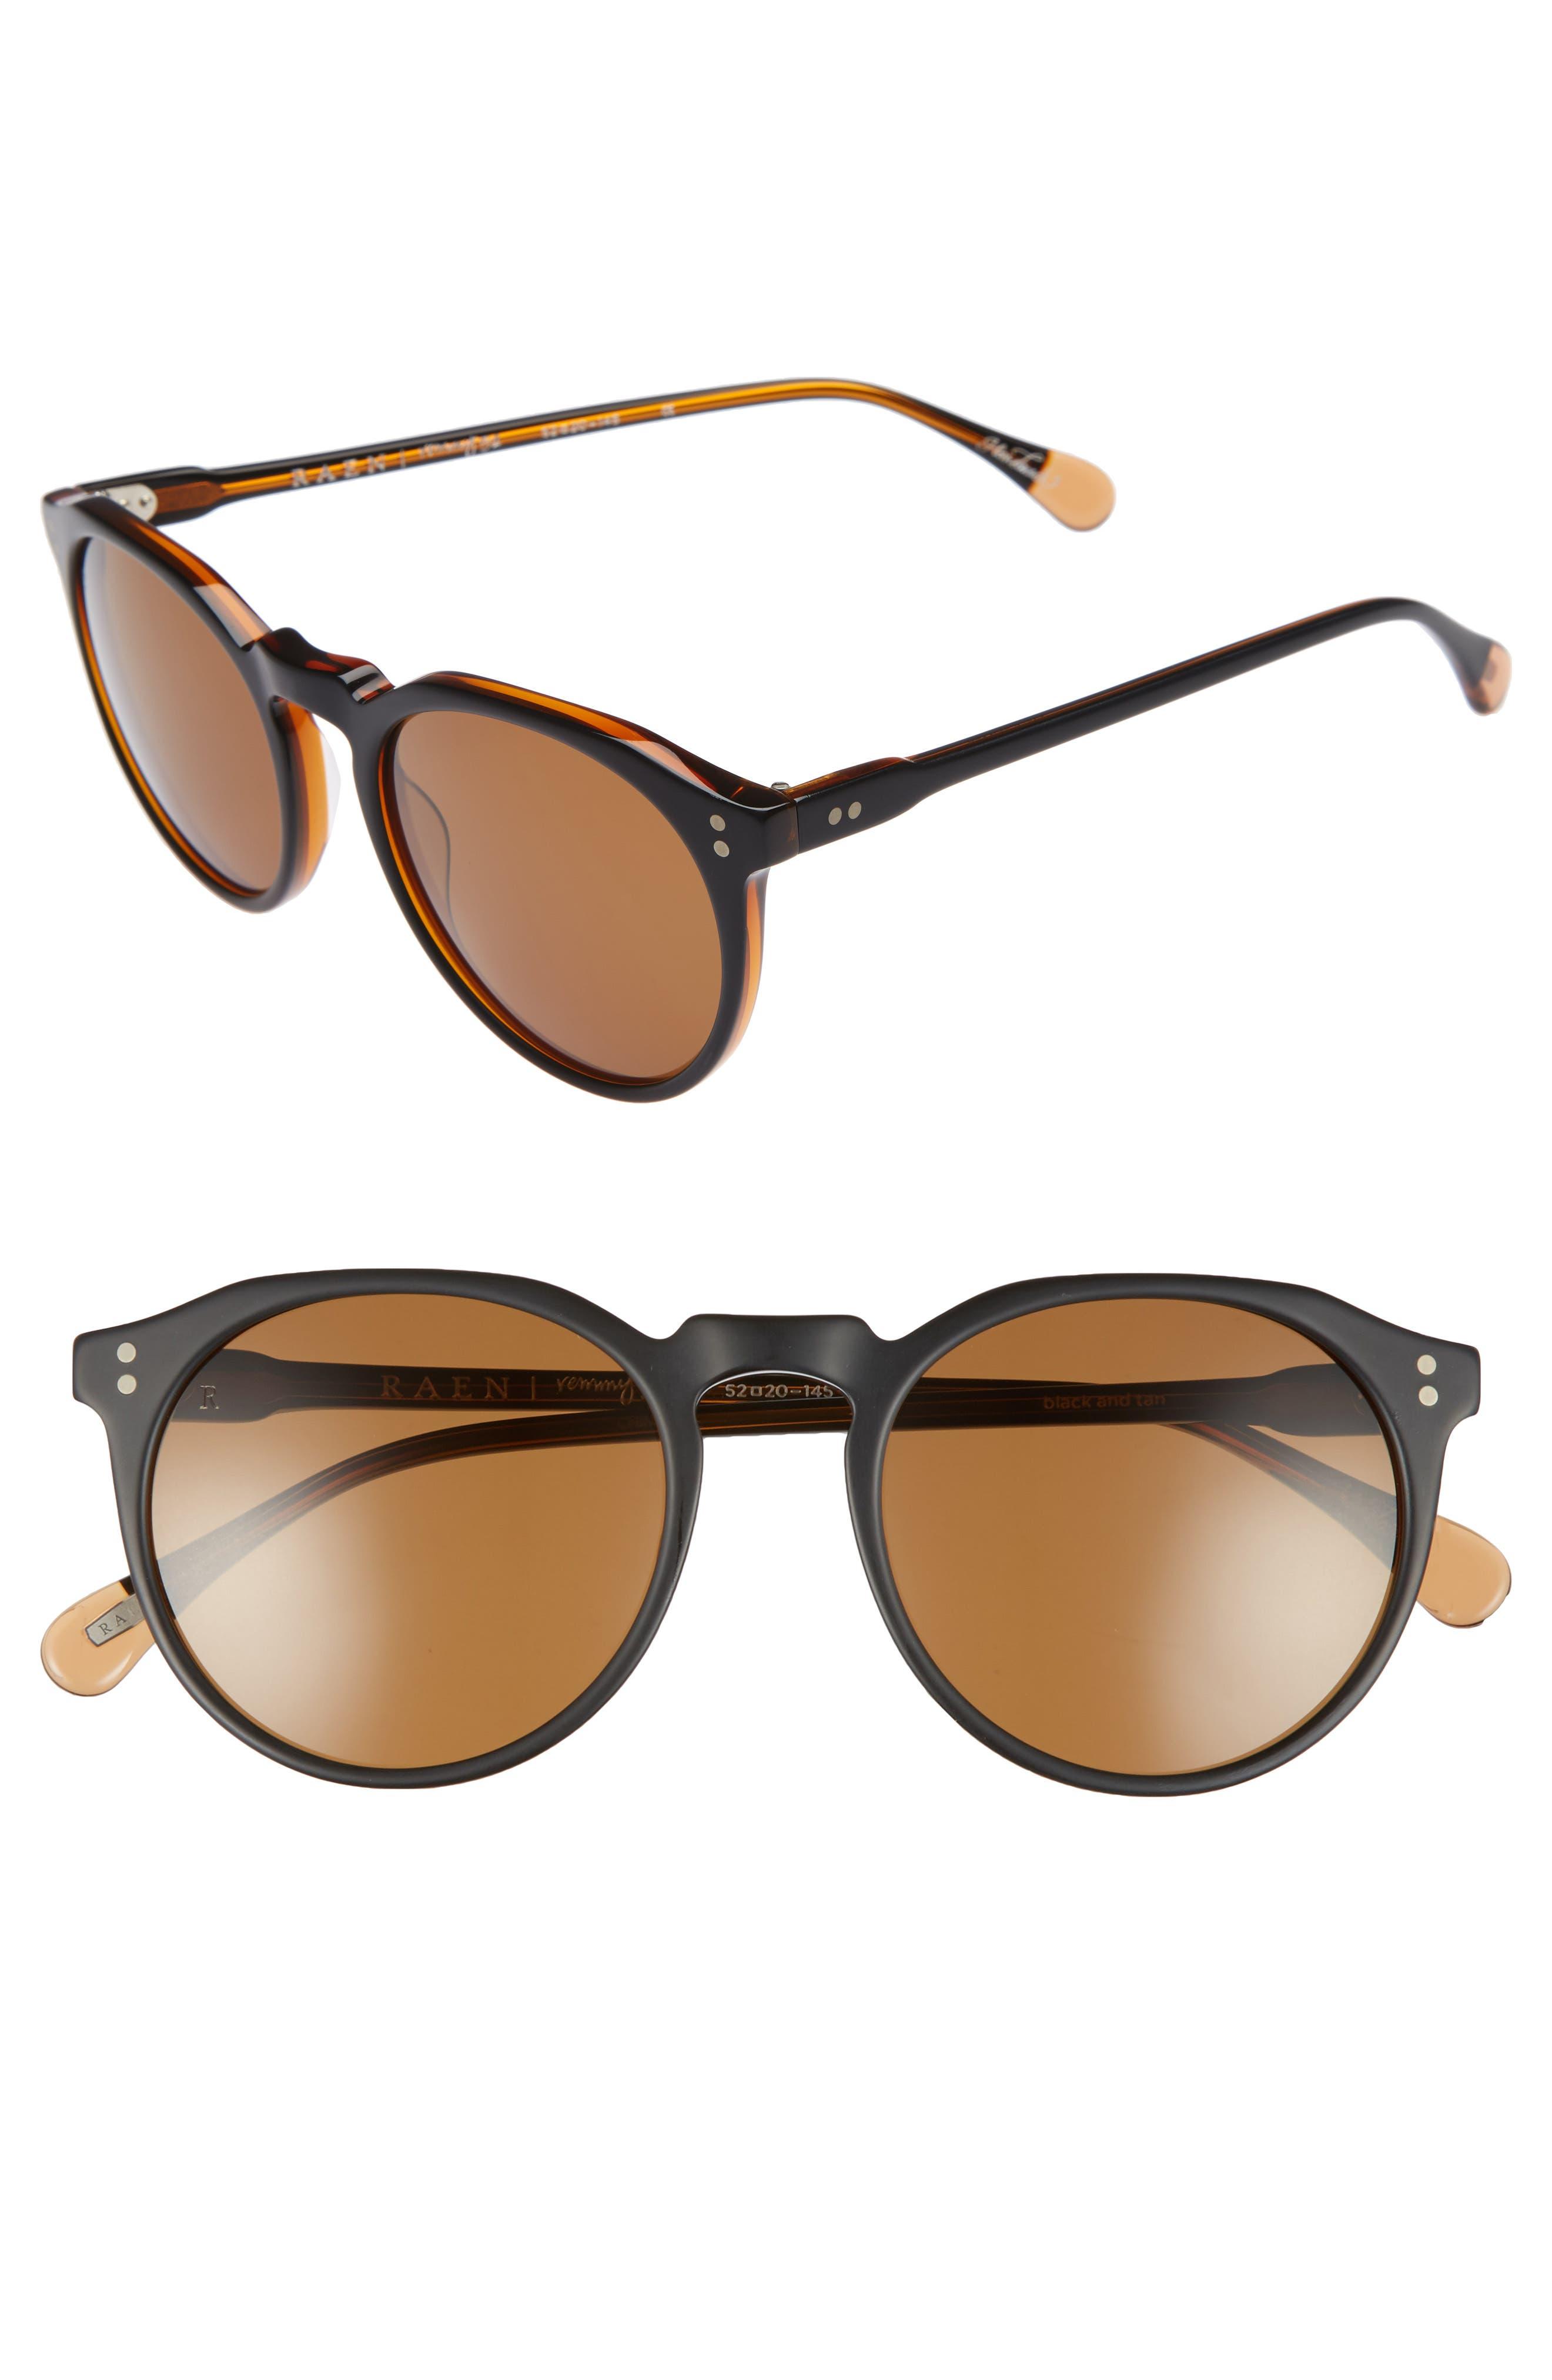 Remmy 52mm Sunglasses,                             Main thumbnail 1, color,                             BLACK/ TAN/ BROWN